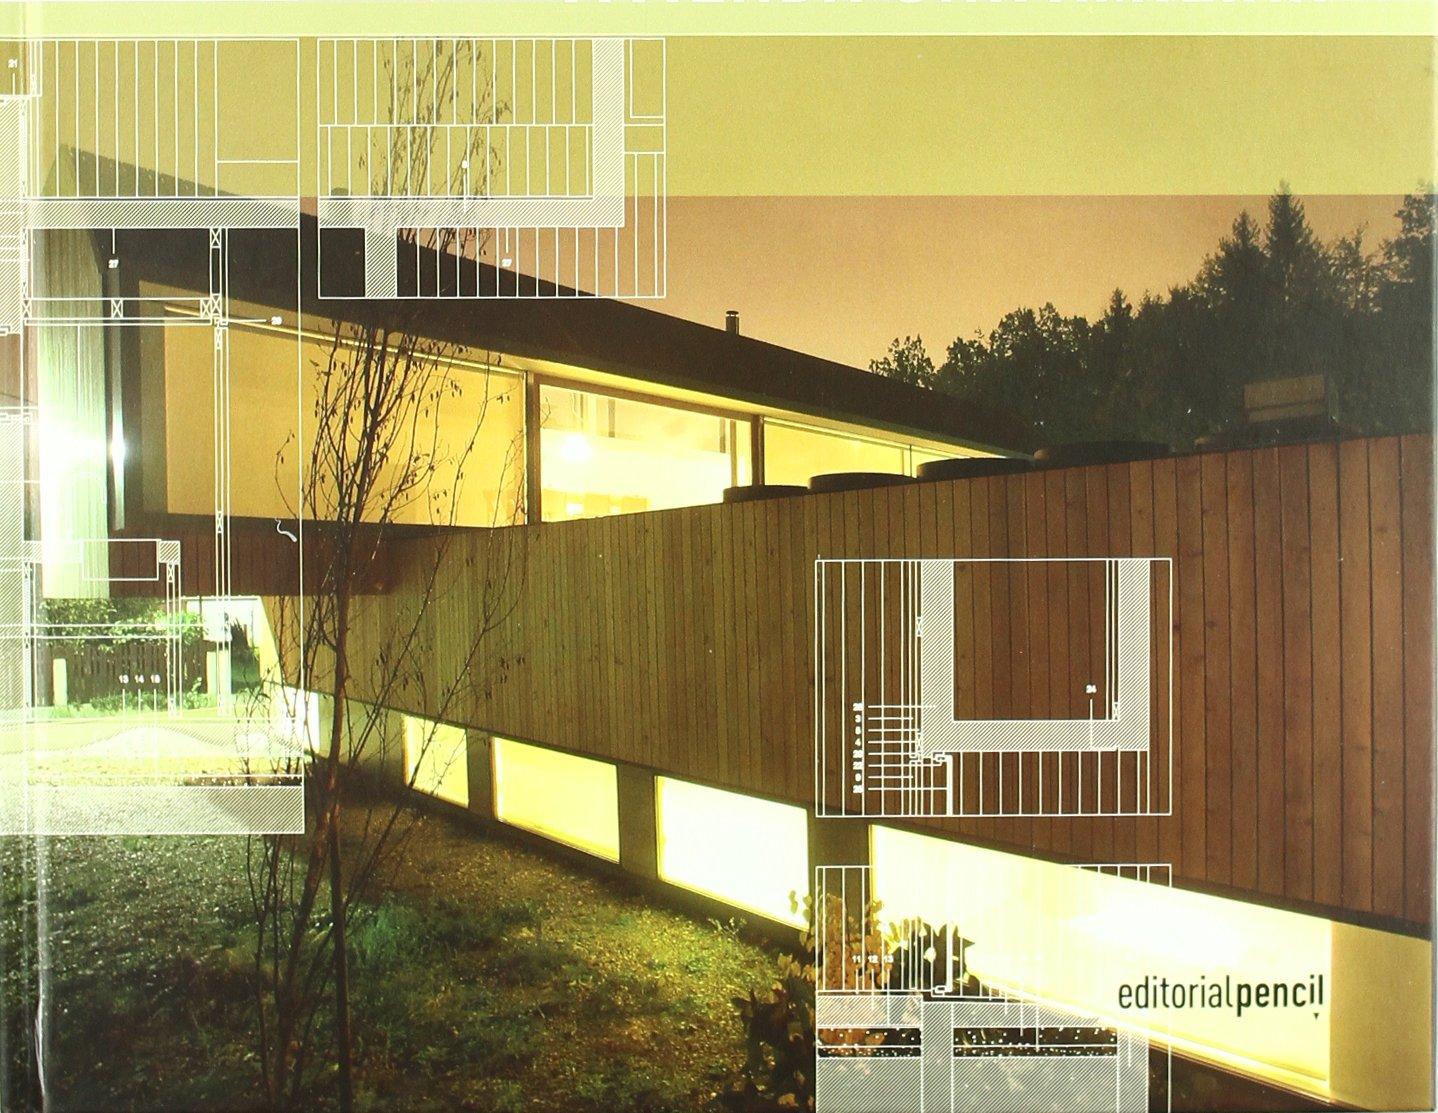 Vivienda Unifamilar 9 (Arquitectura Contemporánea): Amazon.es: Antonio Gimenez Crespo, Conchi Monzonis Pozo, Juan Blesa Cervero: Libros